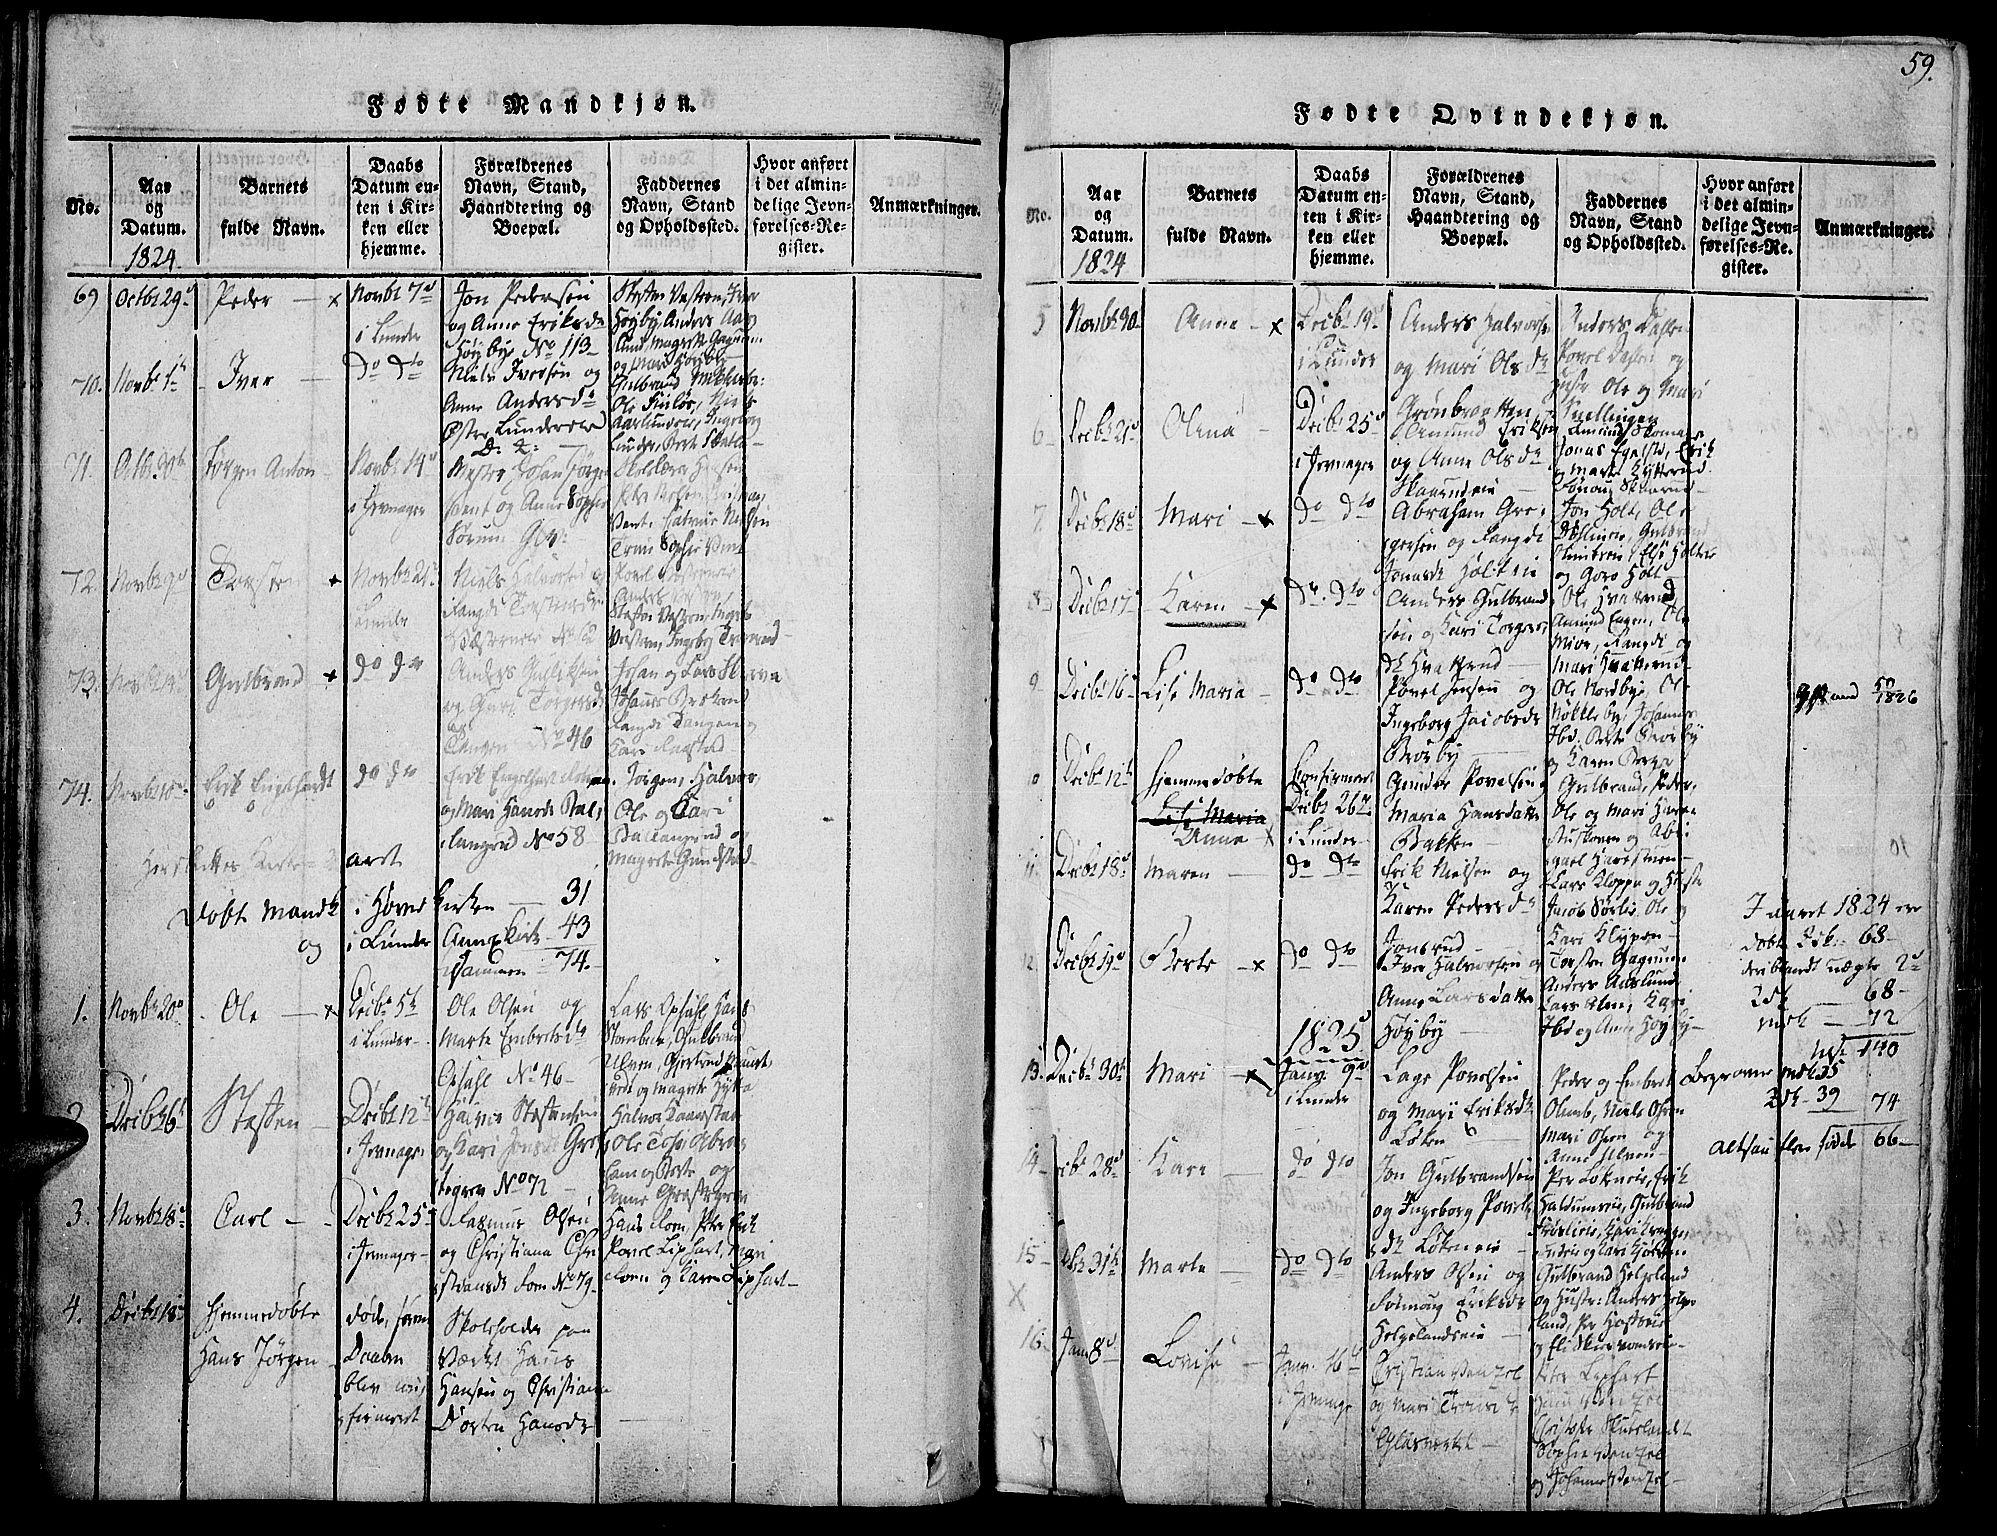 SAH, Jevnaker prestekontor, Ministerialbok nr. 5, 1815-1837, s. 59